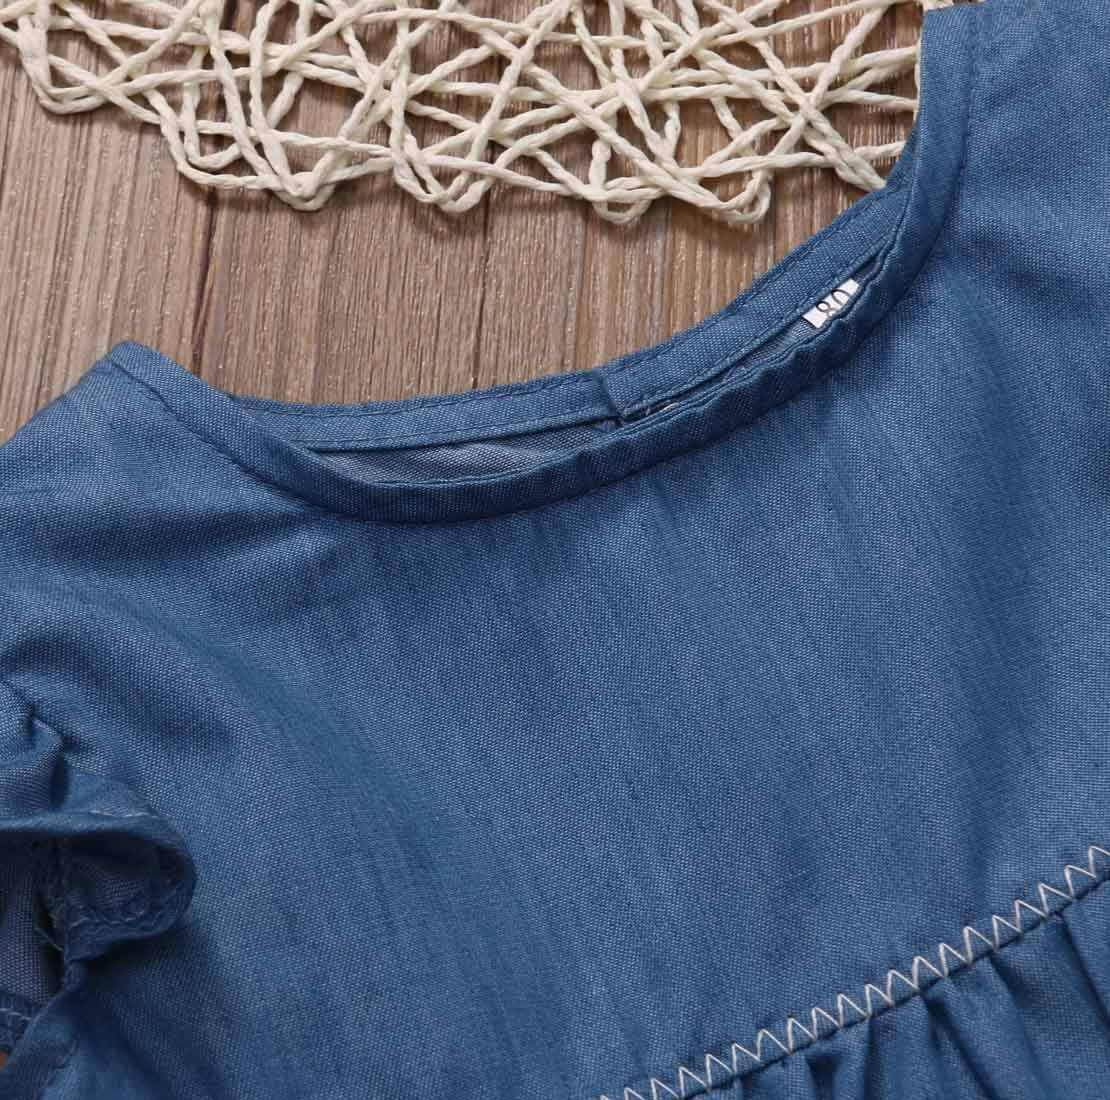 0-24M الصيف عارضة المولود الجديد الفتيان الفتيات ملابس رعاة البقر قميص قمم + سروال مخطط